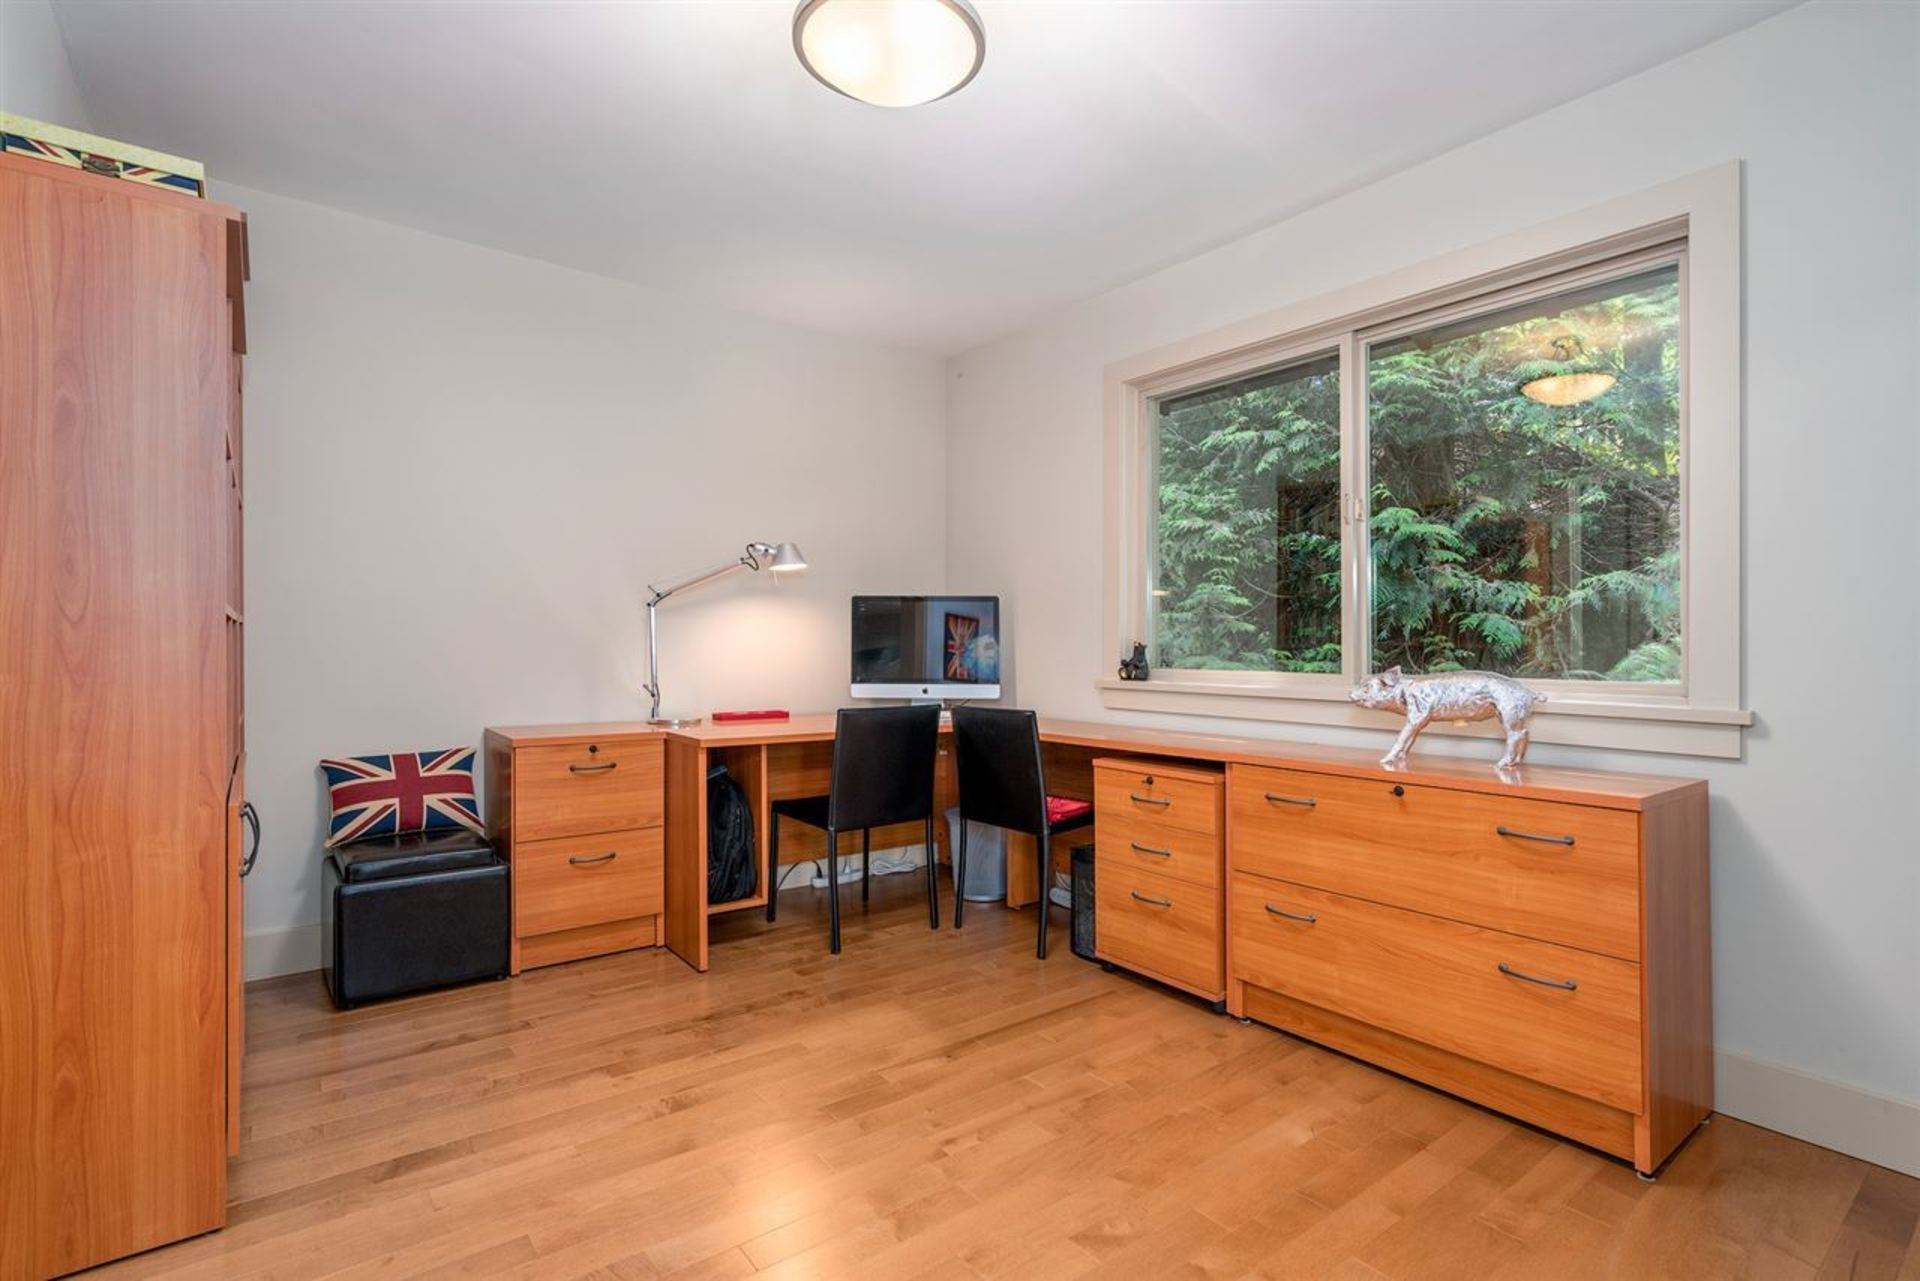 4620-woodburn-road-cypress-park-estates-west-vancouver-12 at 4620 Woodburn Road, Cypress Park Estates, West Vancouver